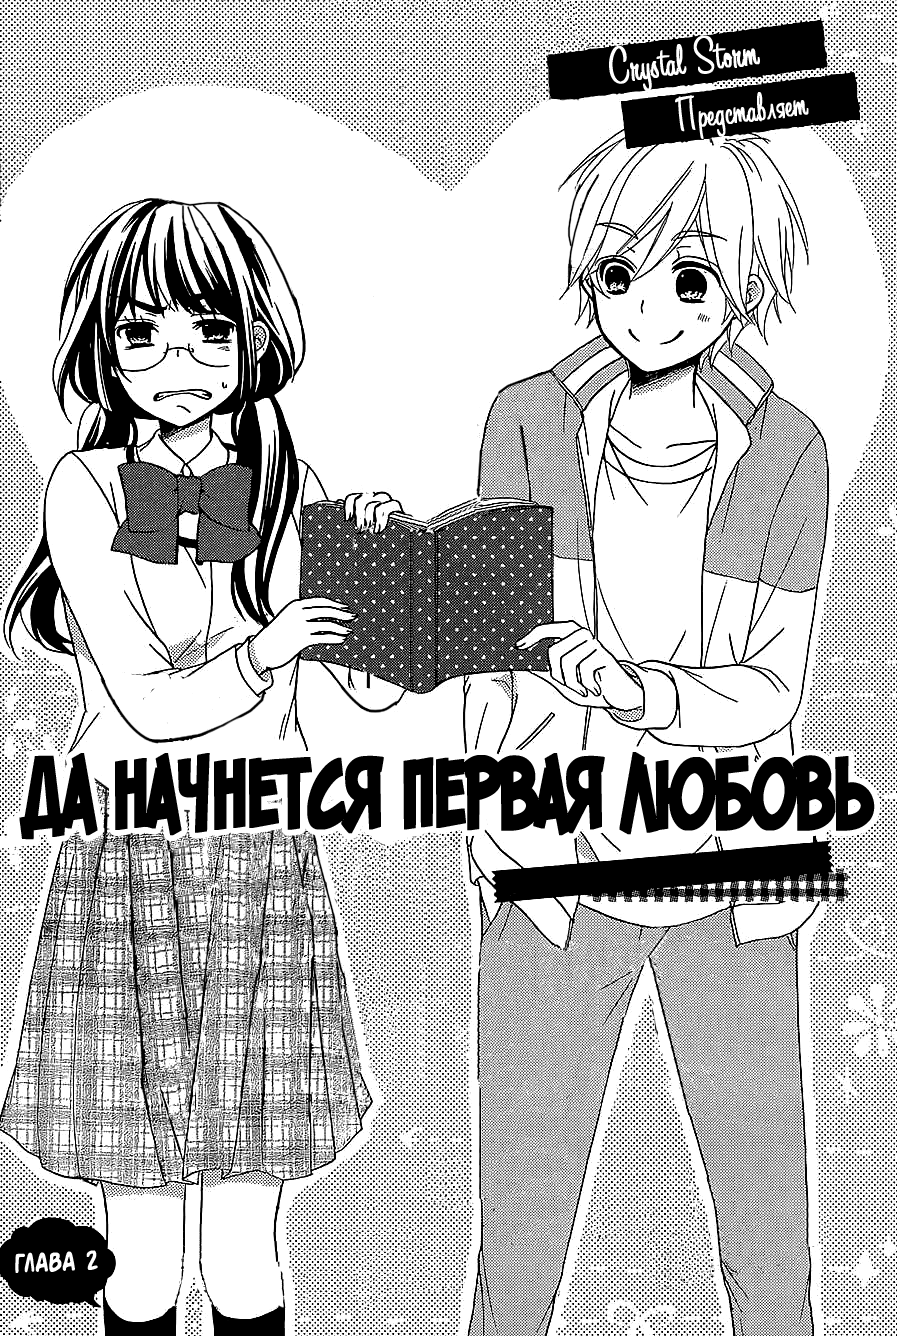 https://r1.ninemanga.com/comics/pic2/10/27402/277903/1447179753739.jpg Page 1